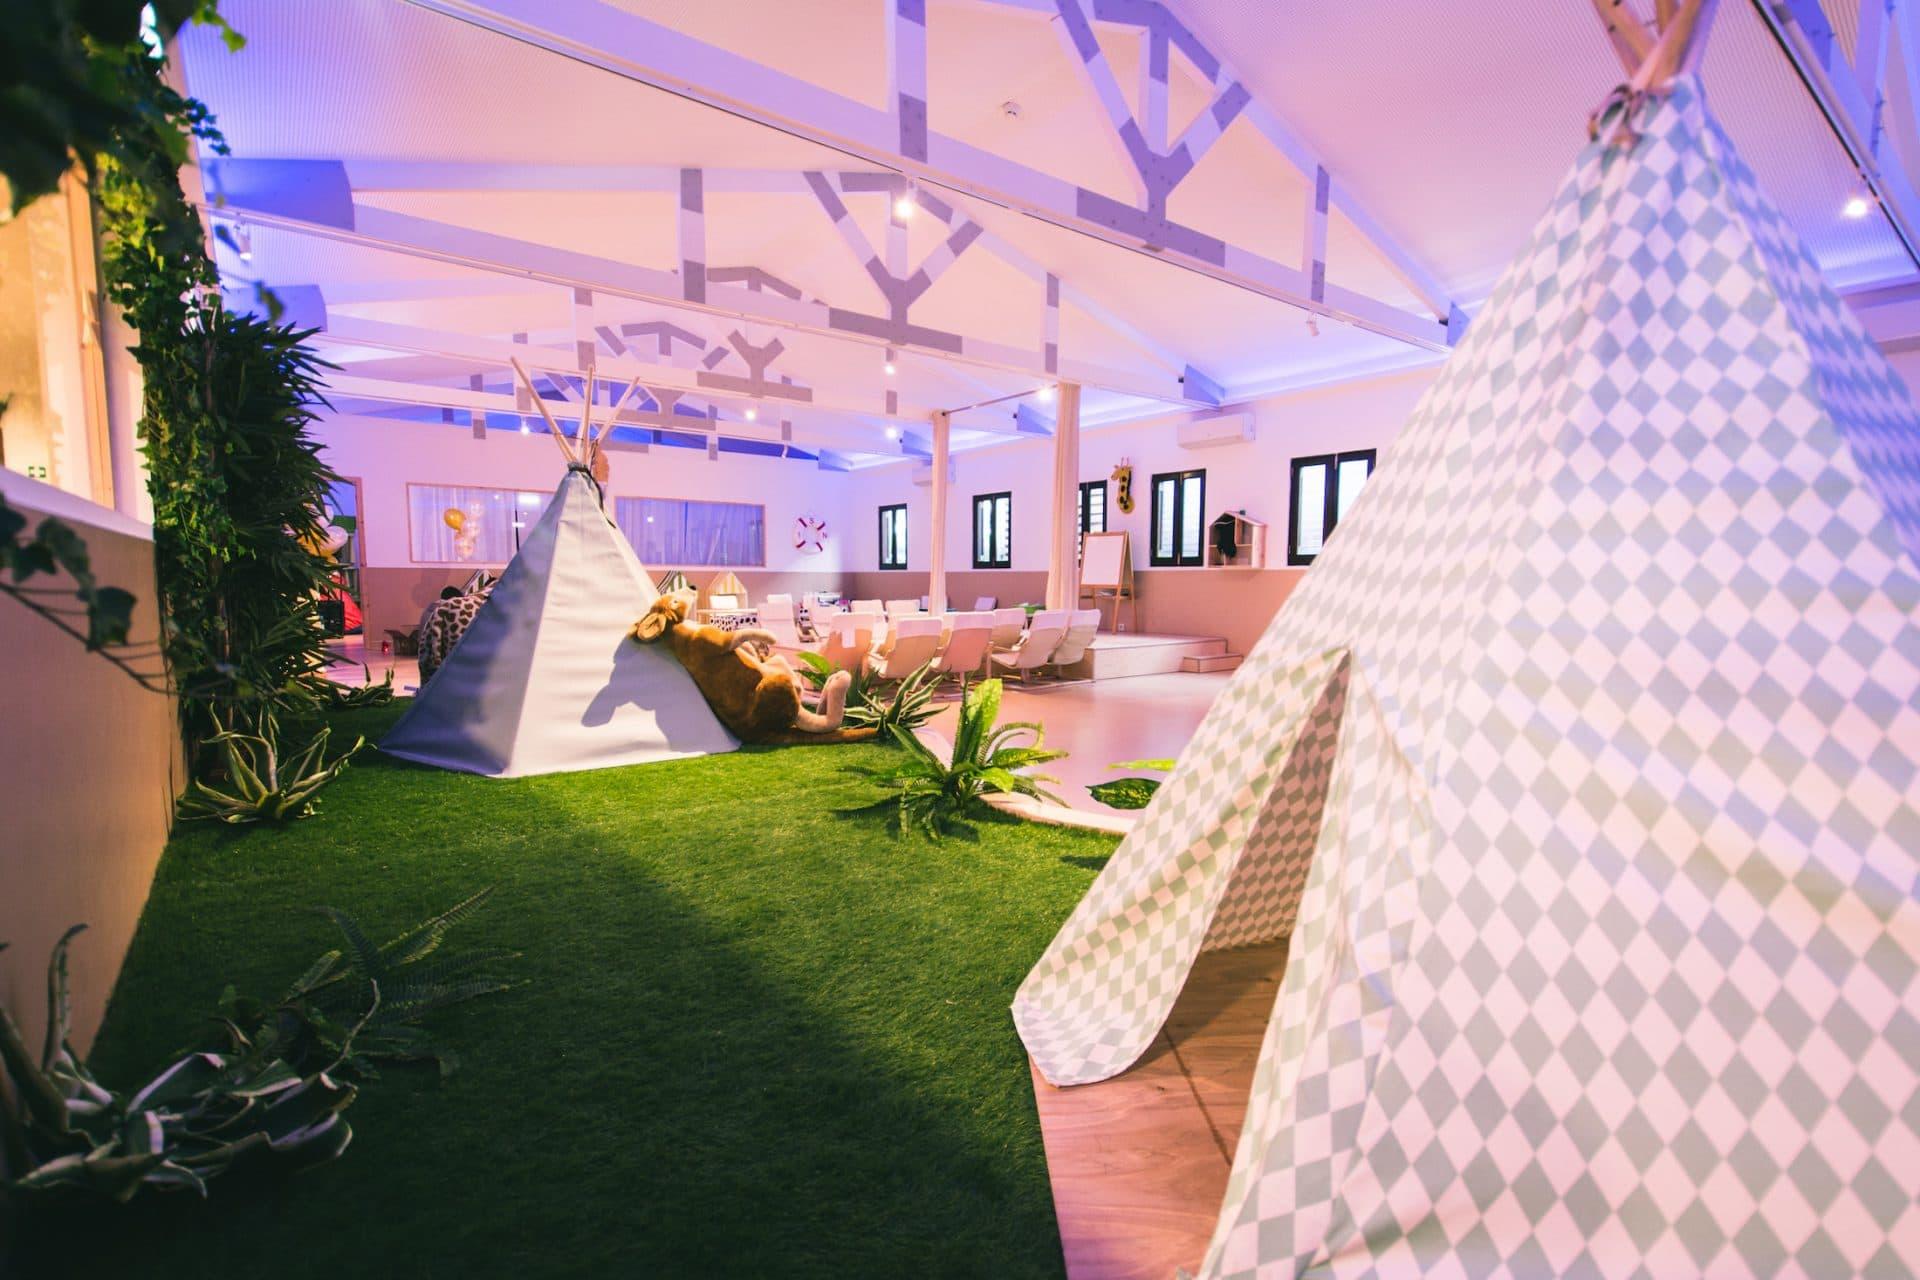 kidsclub-banner-vidamar-hotels-resorts-algarve